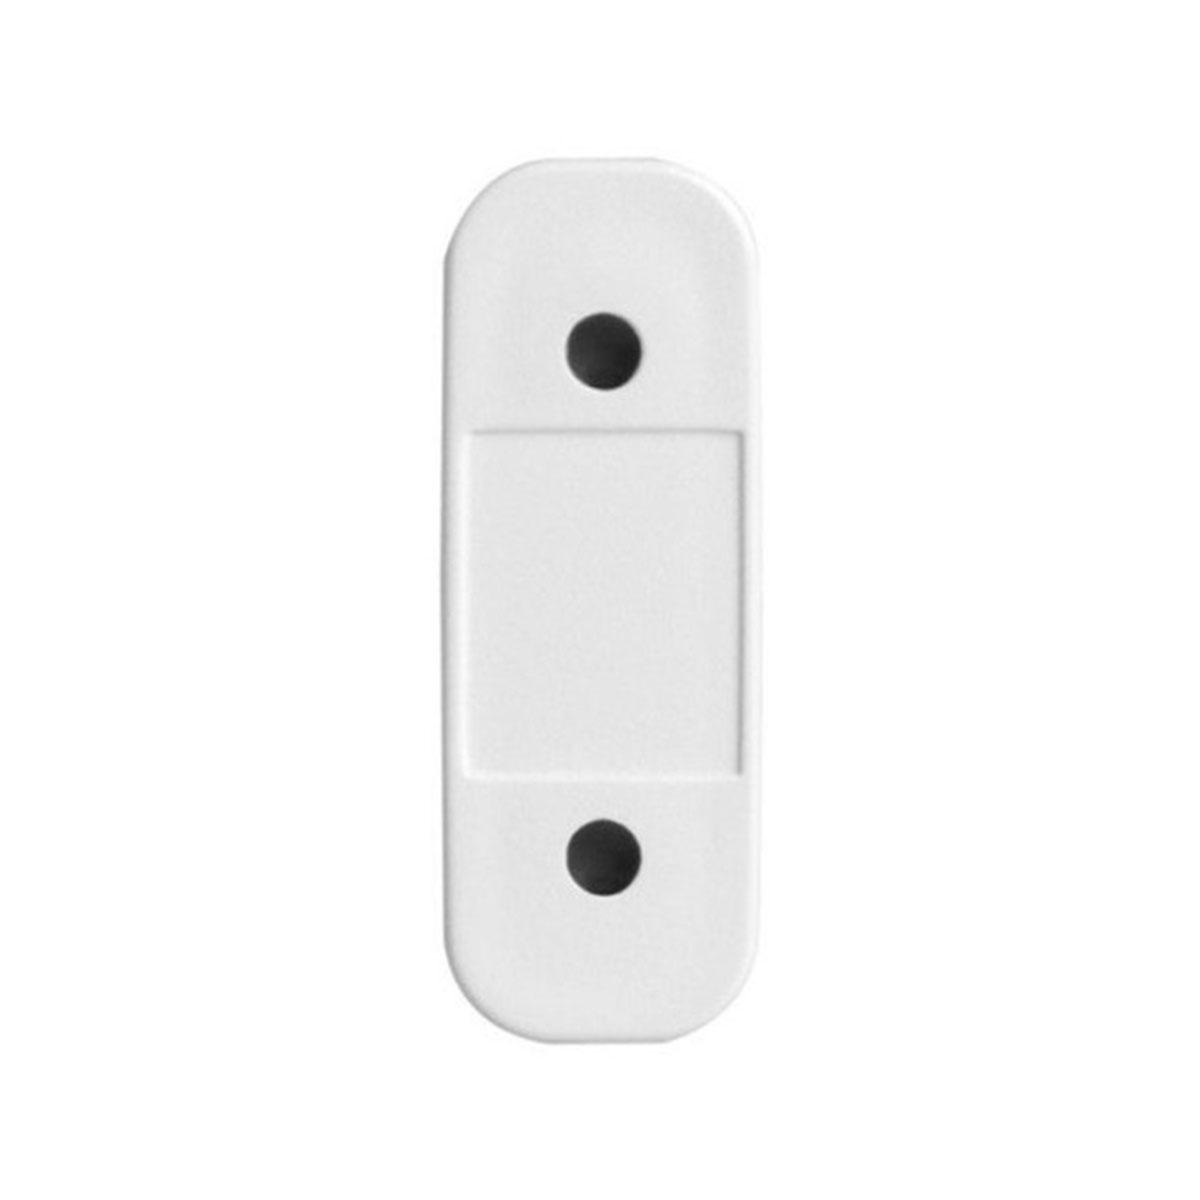 Kit 06 Sensor Magnético Sem Fio Intelbras Xas Light Branco